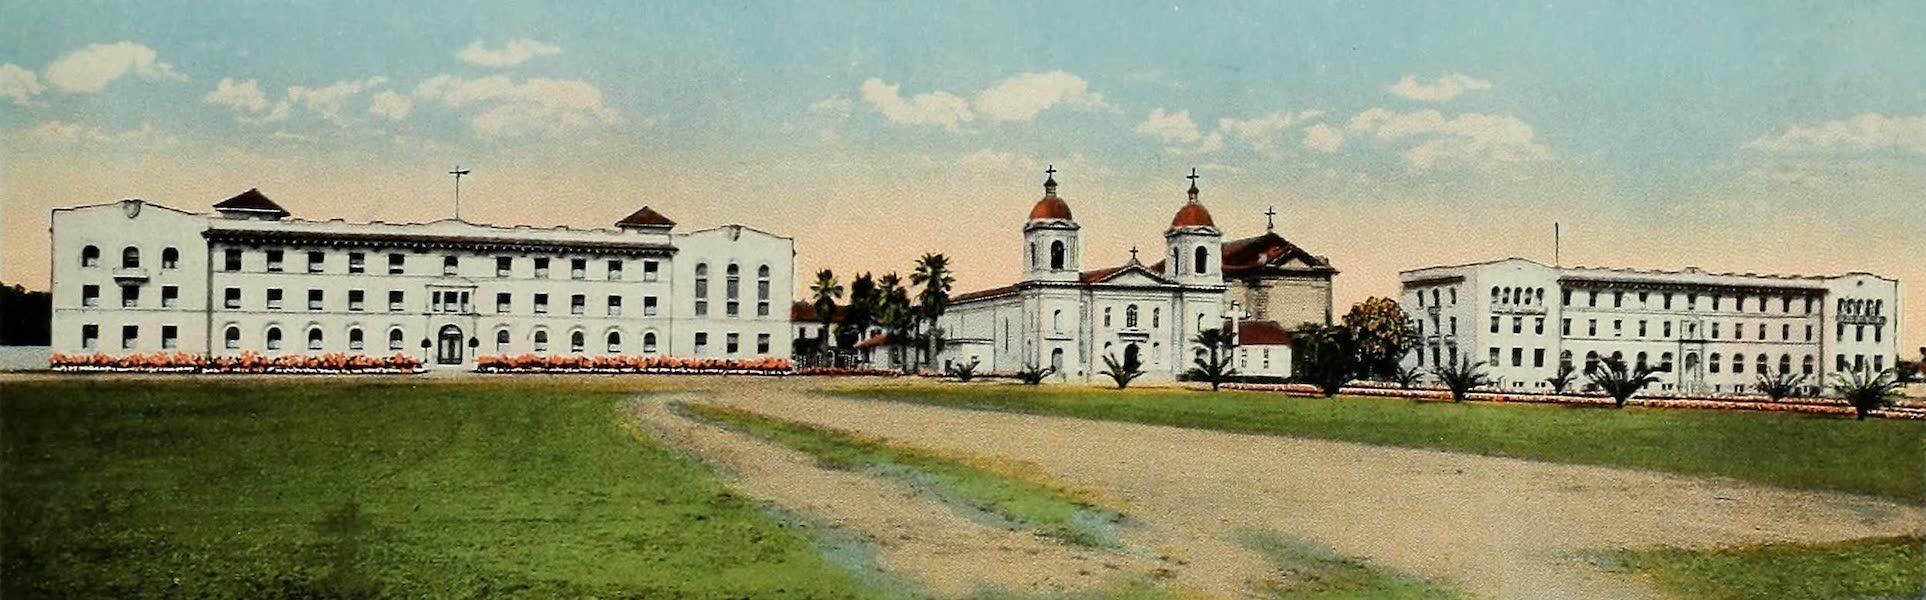 Souvenir Album of Jesuit Colleges and Universities - University of Santa Clara, Santa Clara, Cal. (1918)